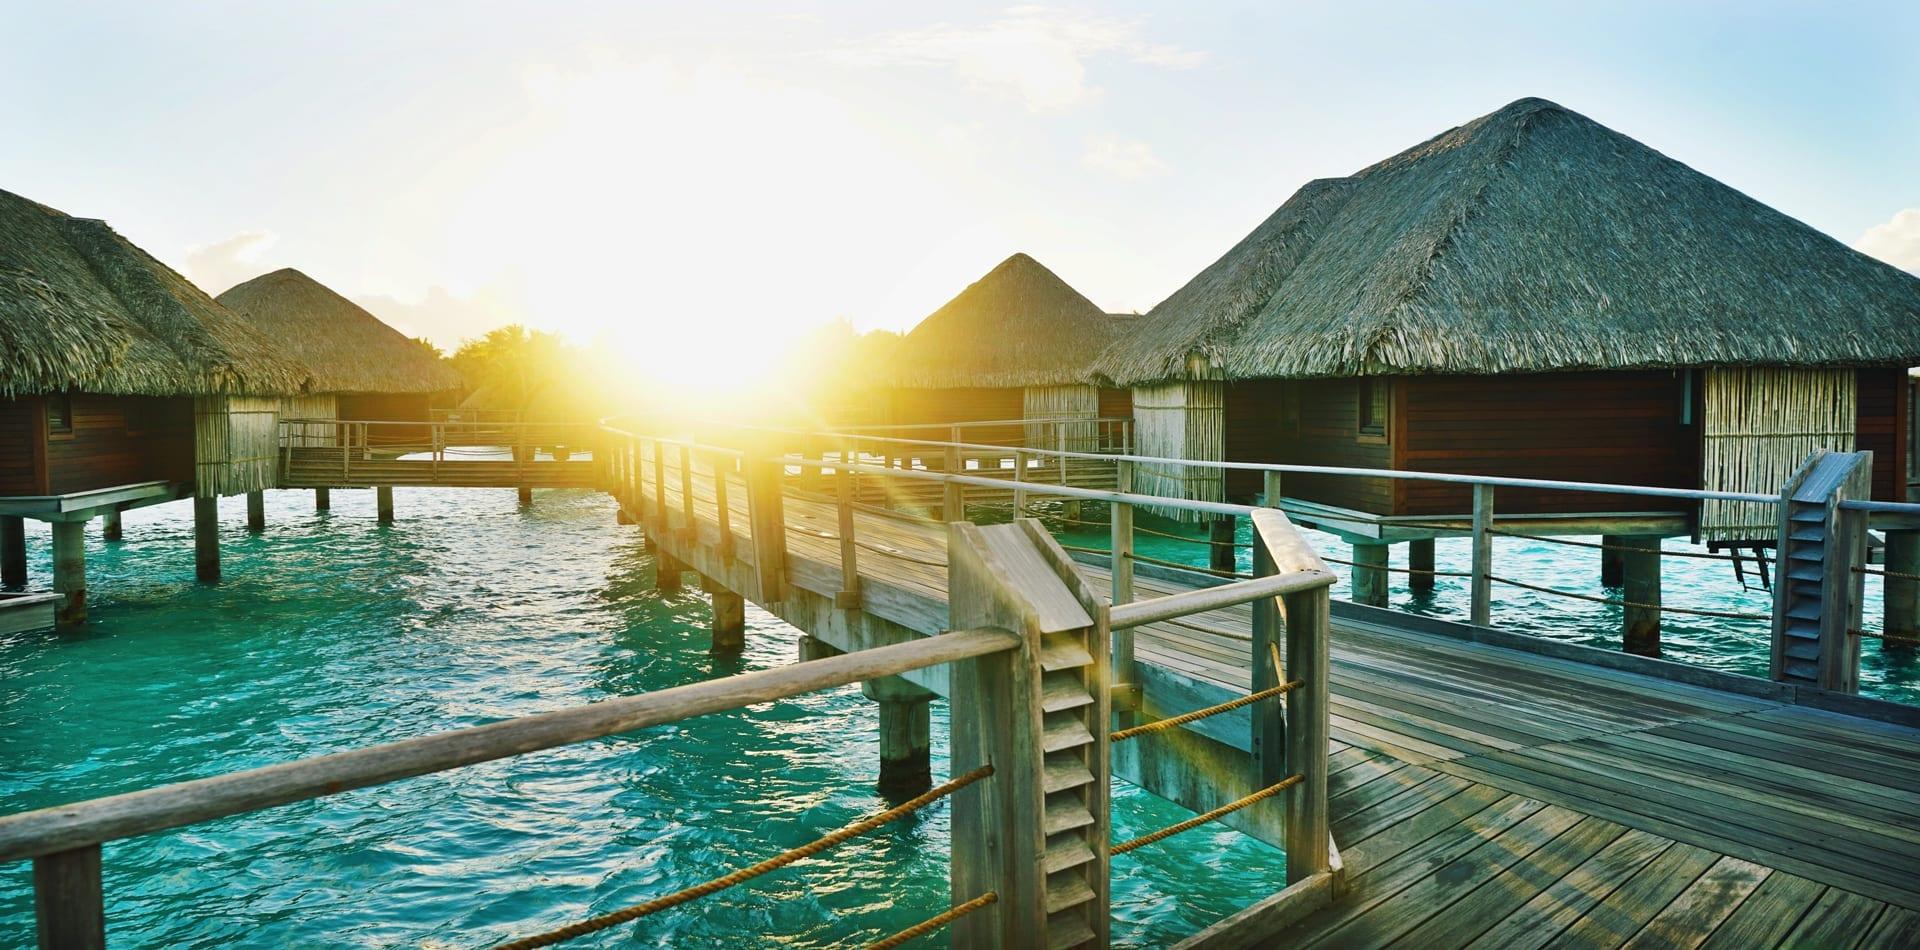 Bora Bora French Polynesia huts